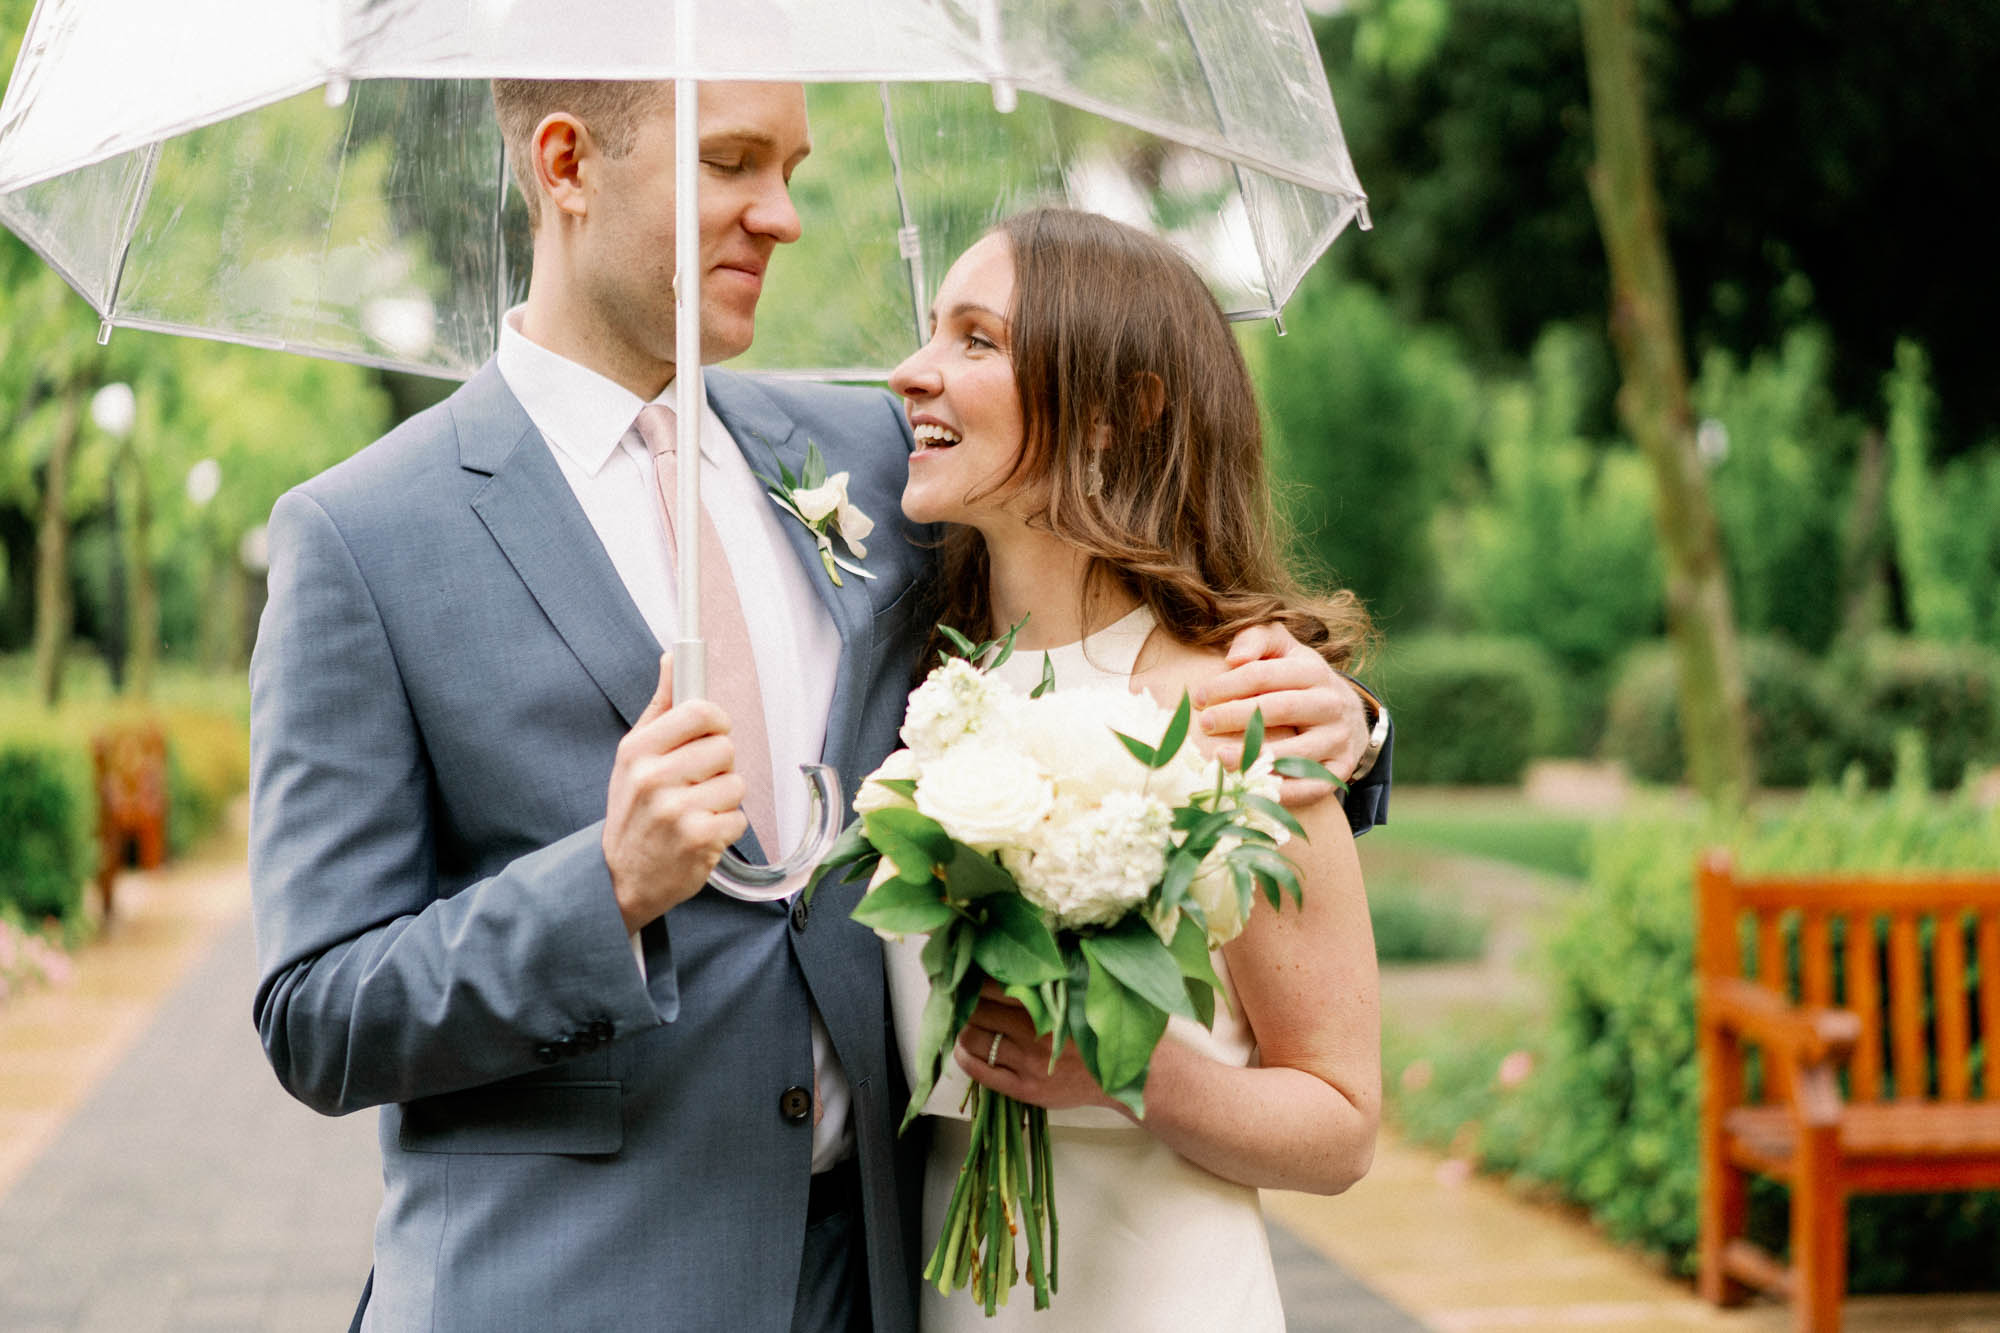 Vina Enoteca Palo Alto Wedding 011.jpg